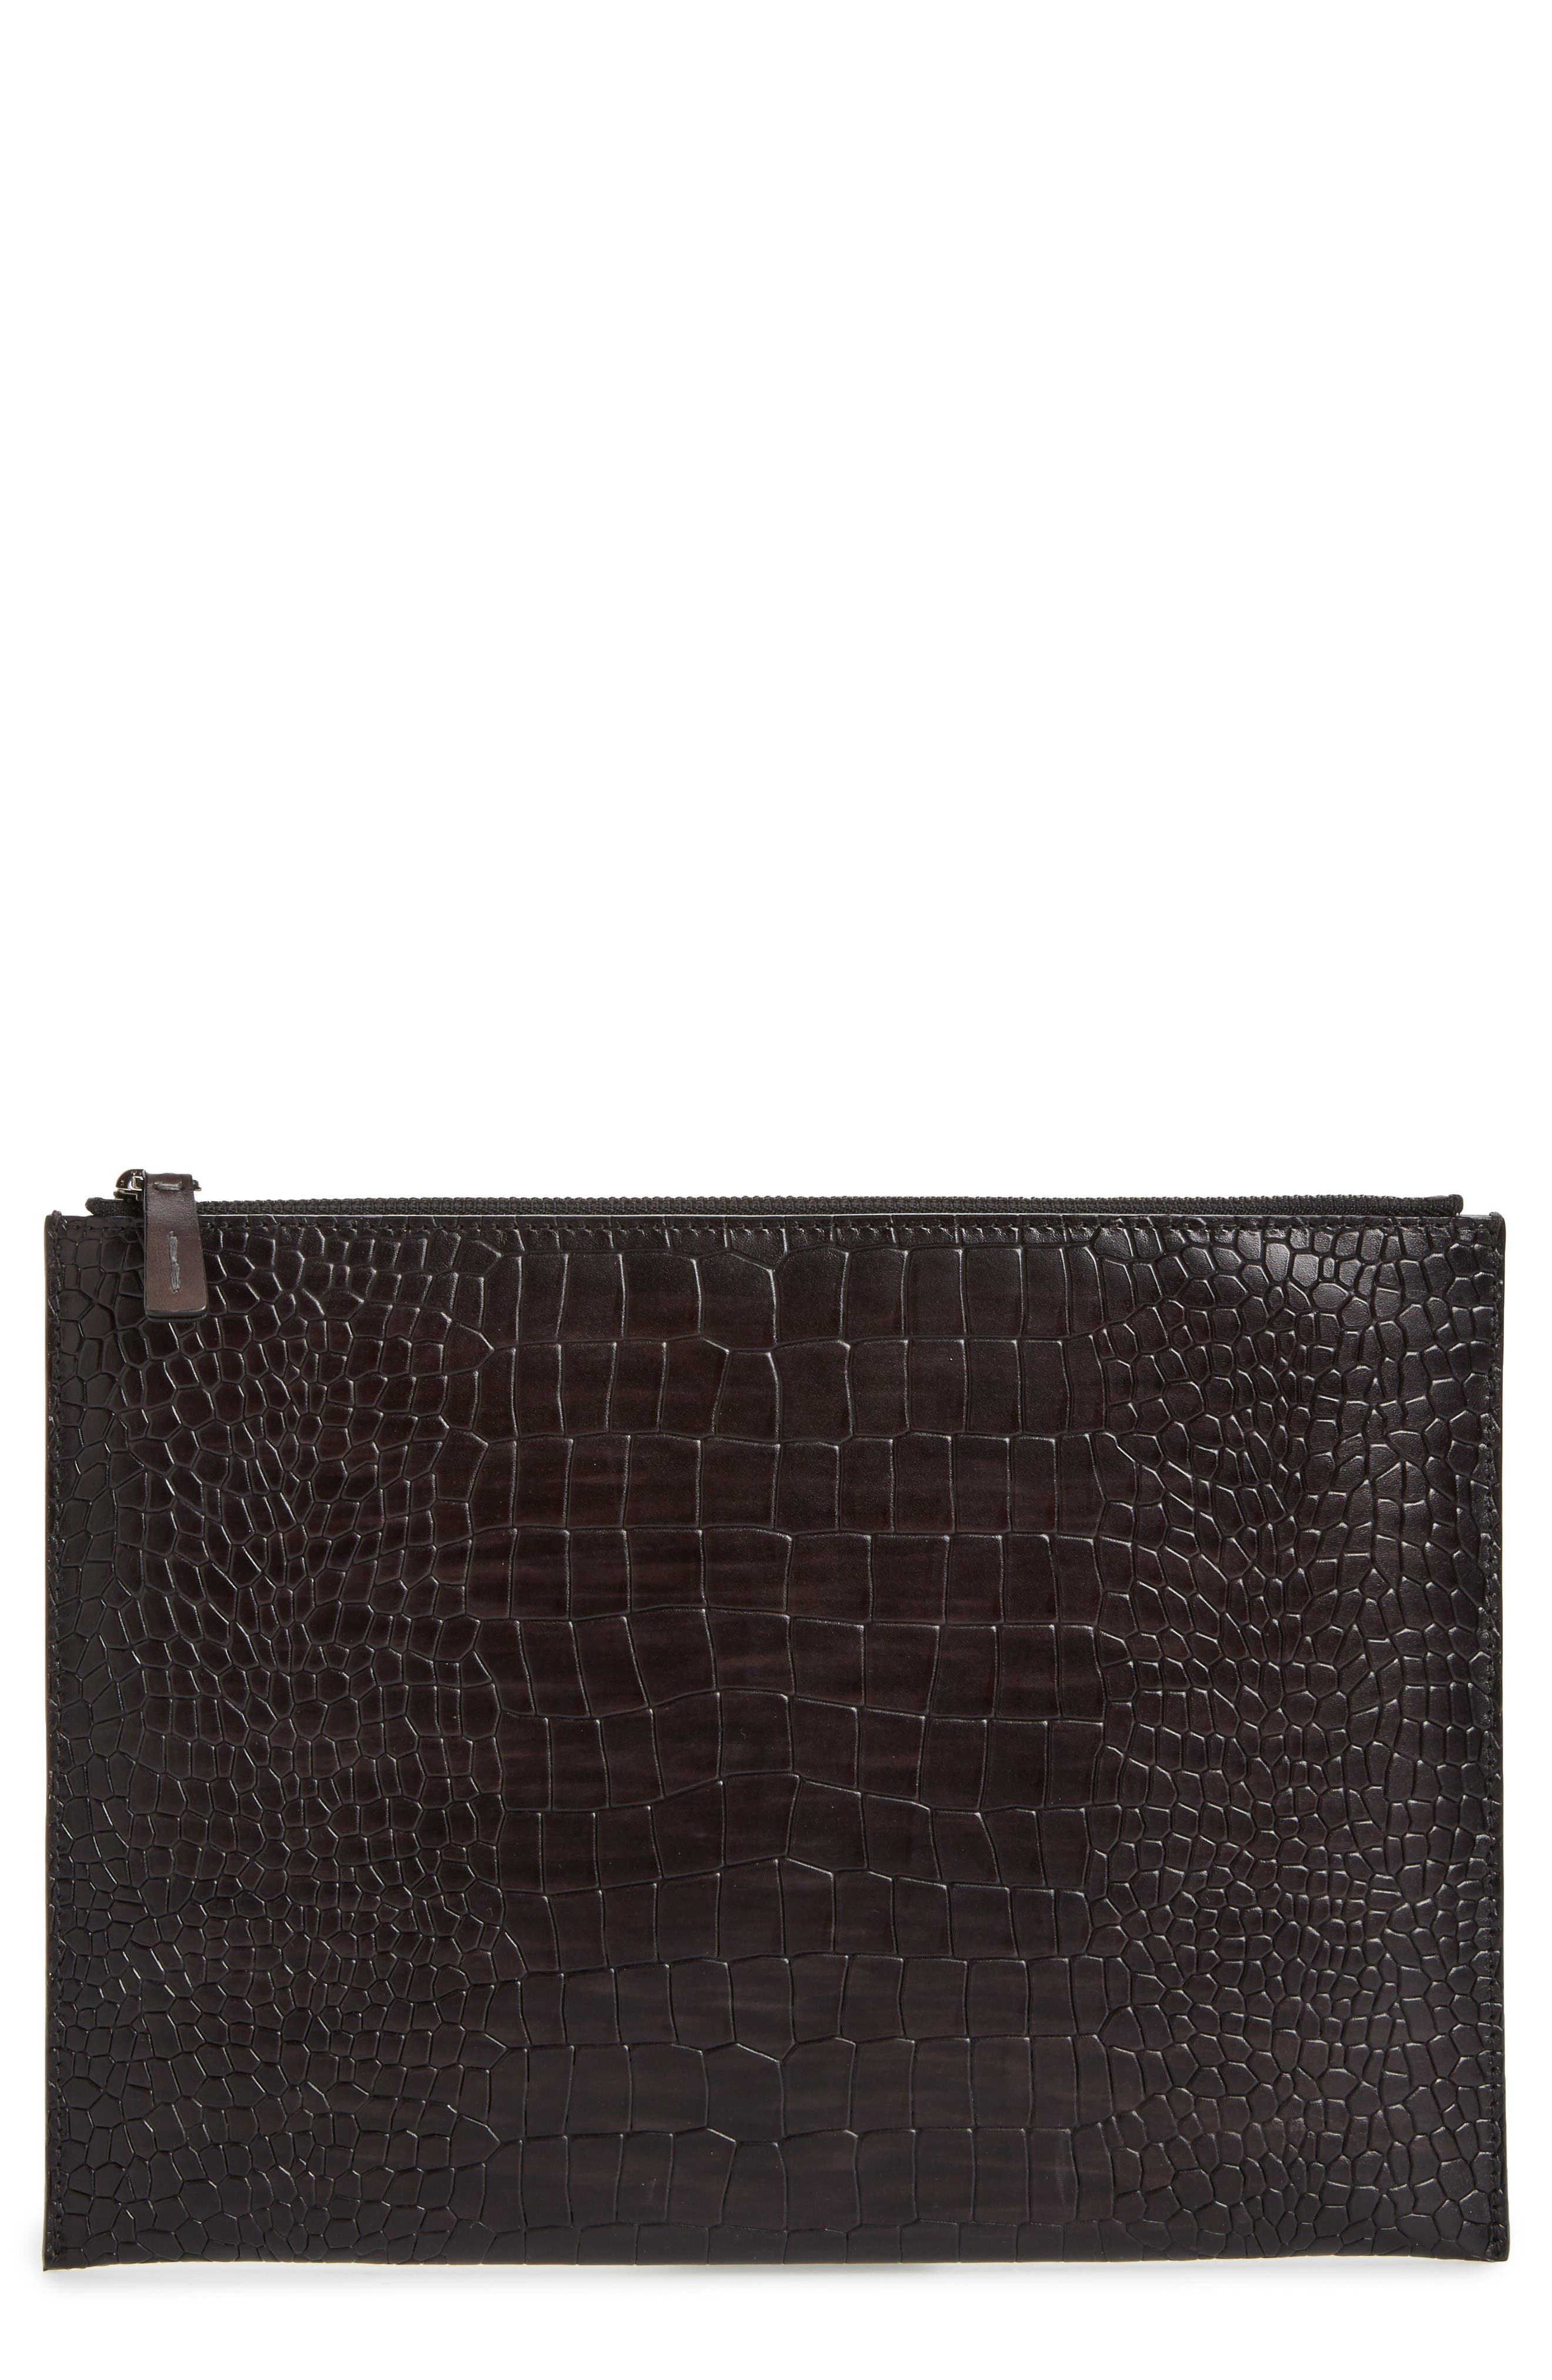 Main Image - Magnanni Leather Tablet Case